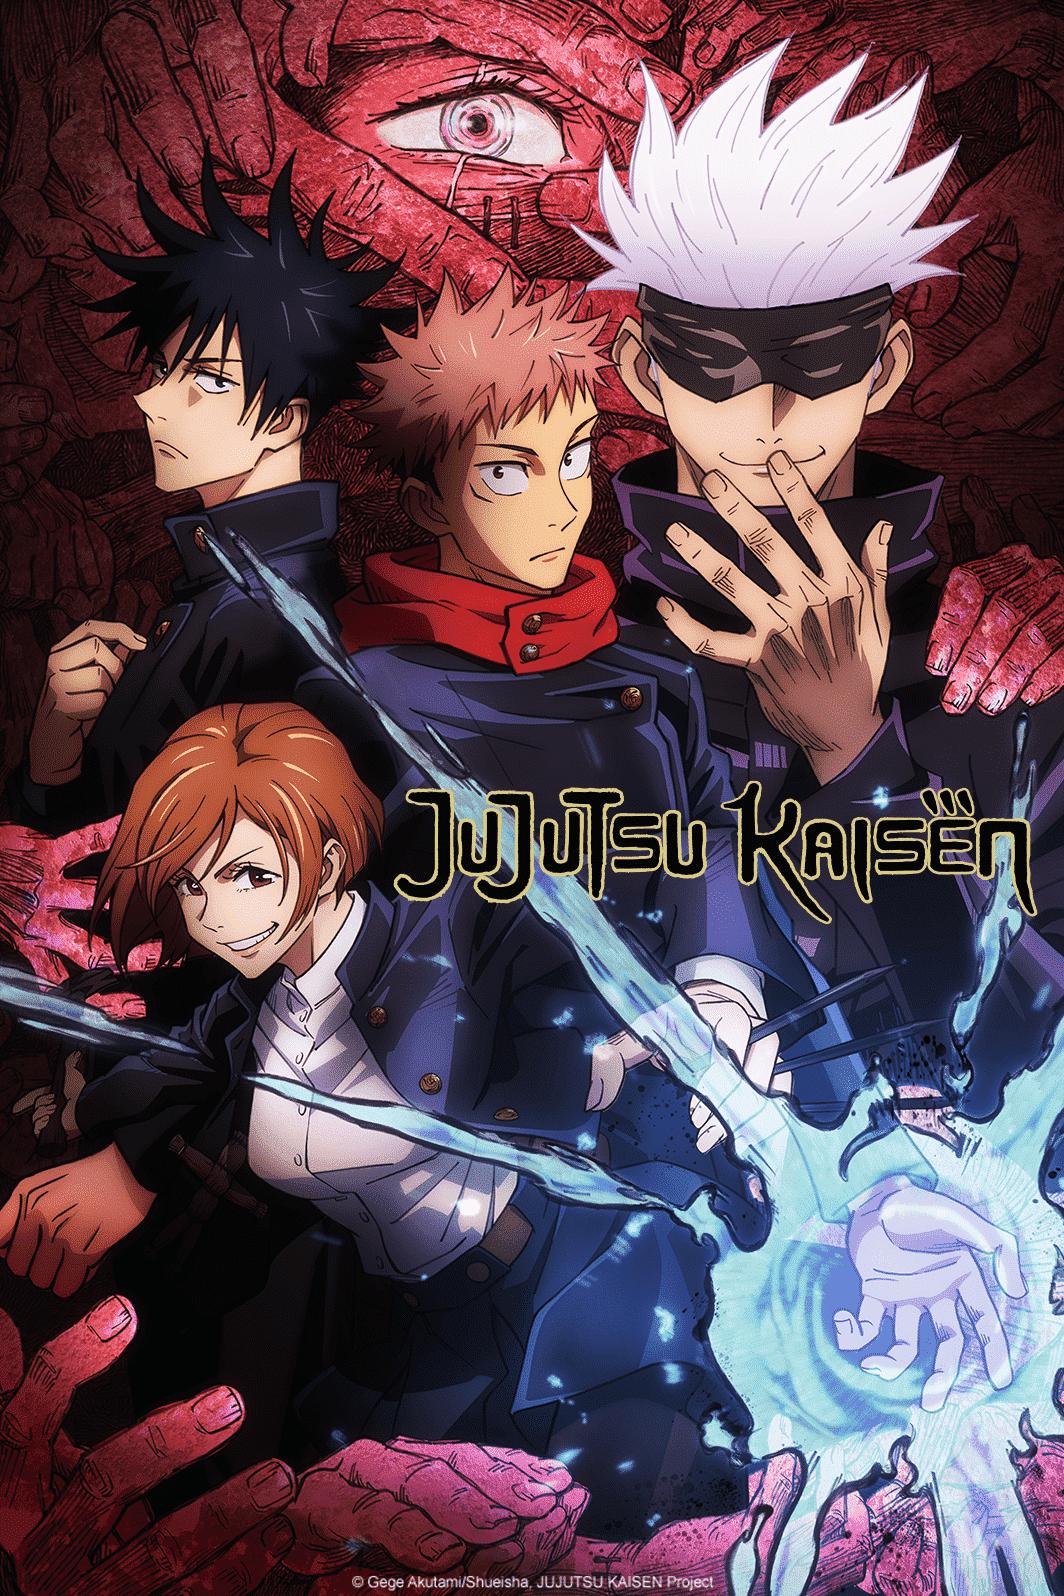 Jujutsu Kaisen (2020) มหาเวทย์ผนึกมาร ซับไทย EP1 – EP9